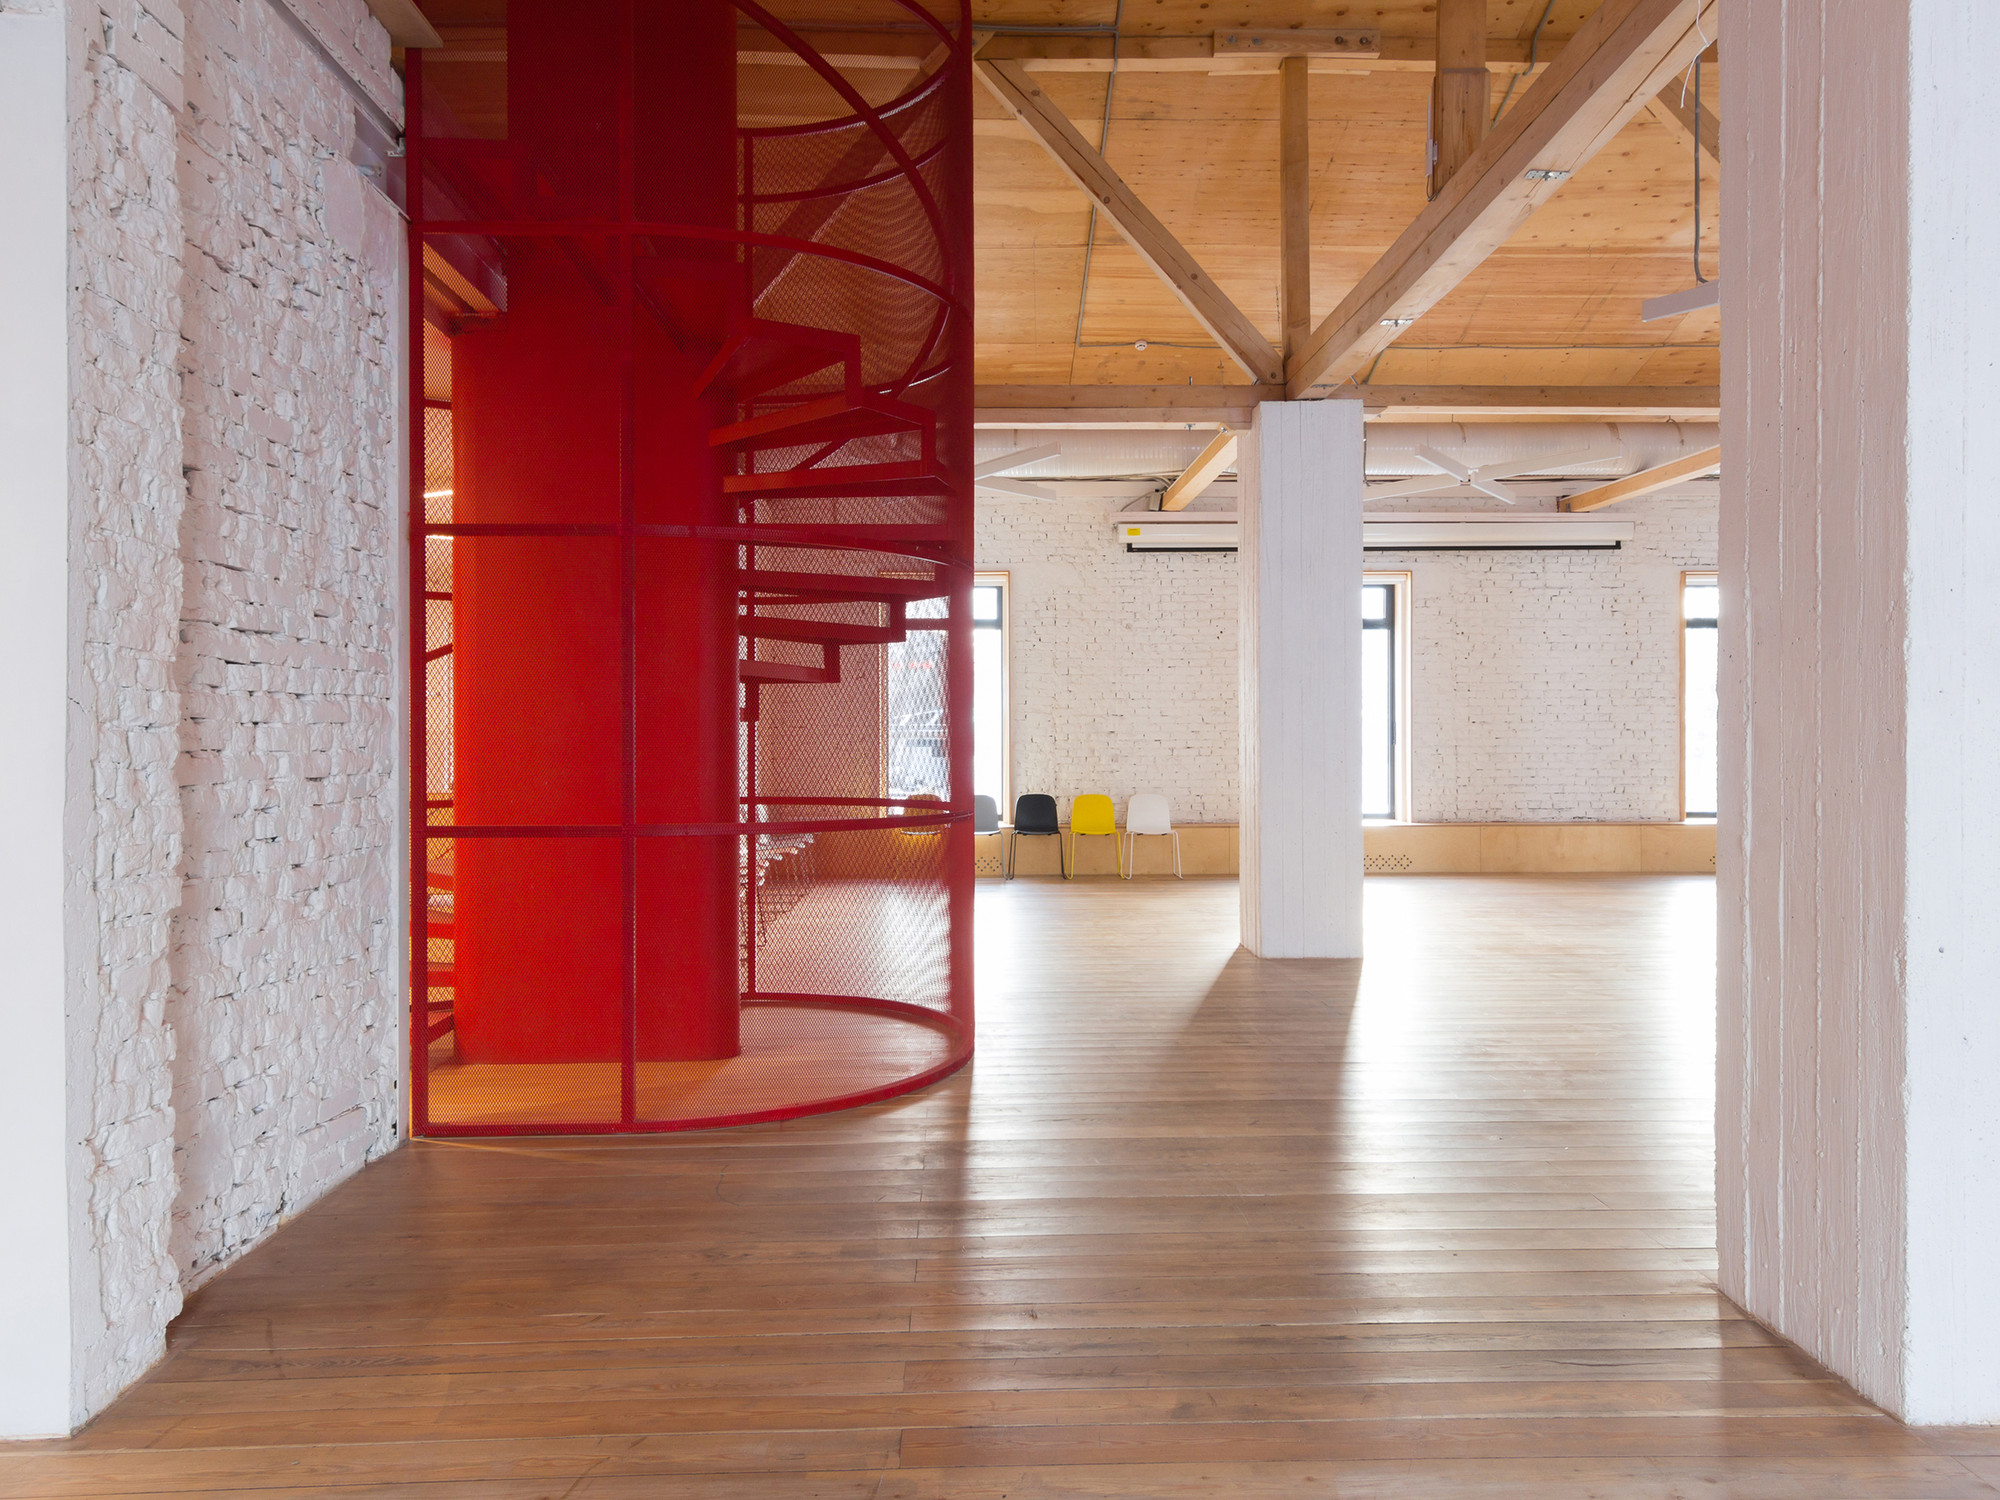 Gallery of Garage CCC Education Center FORM Bureau 1